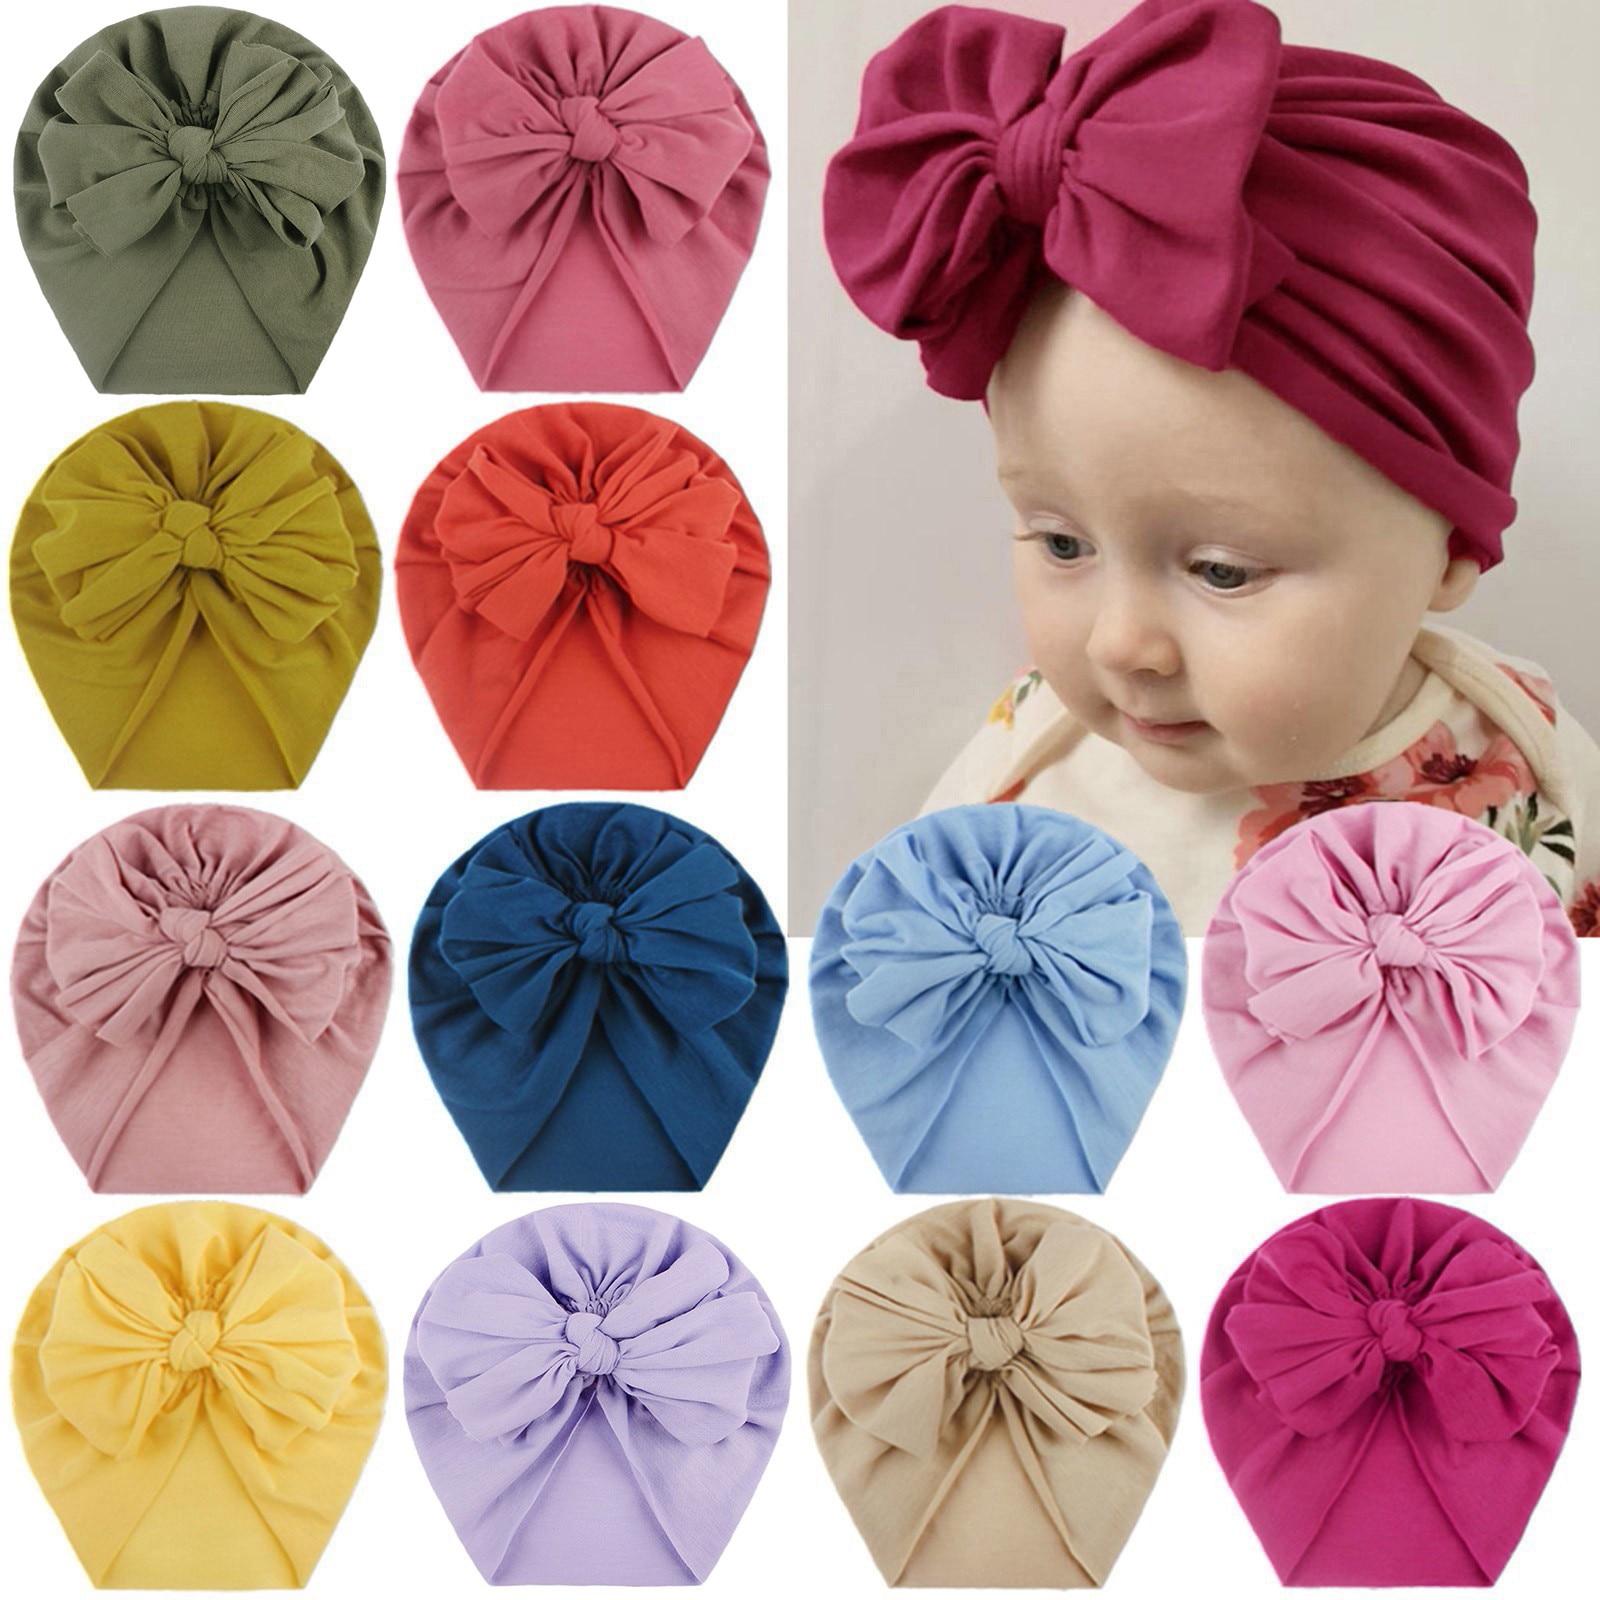 Newborn Baby Kids Turban Bowknot Head Wrap Boy Girls India Beanie Hats Soft Cap